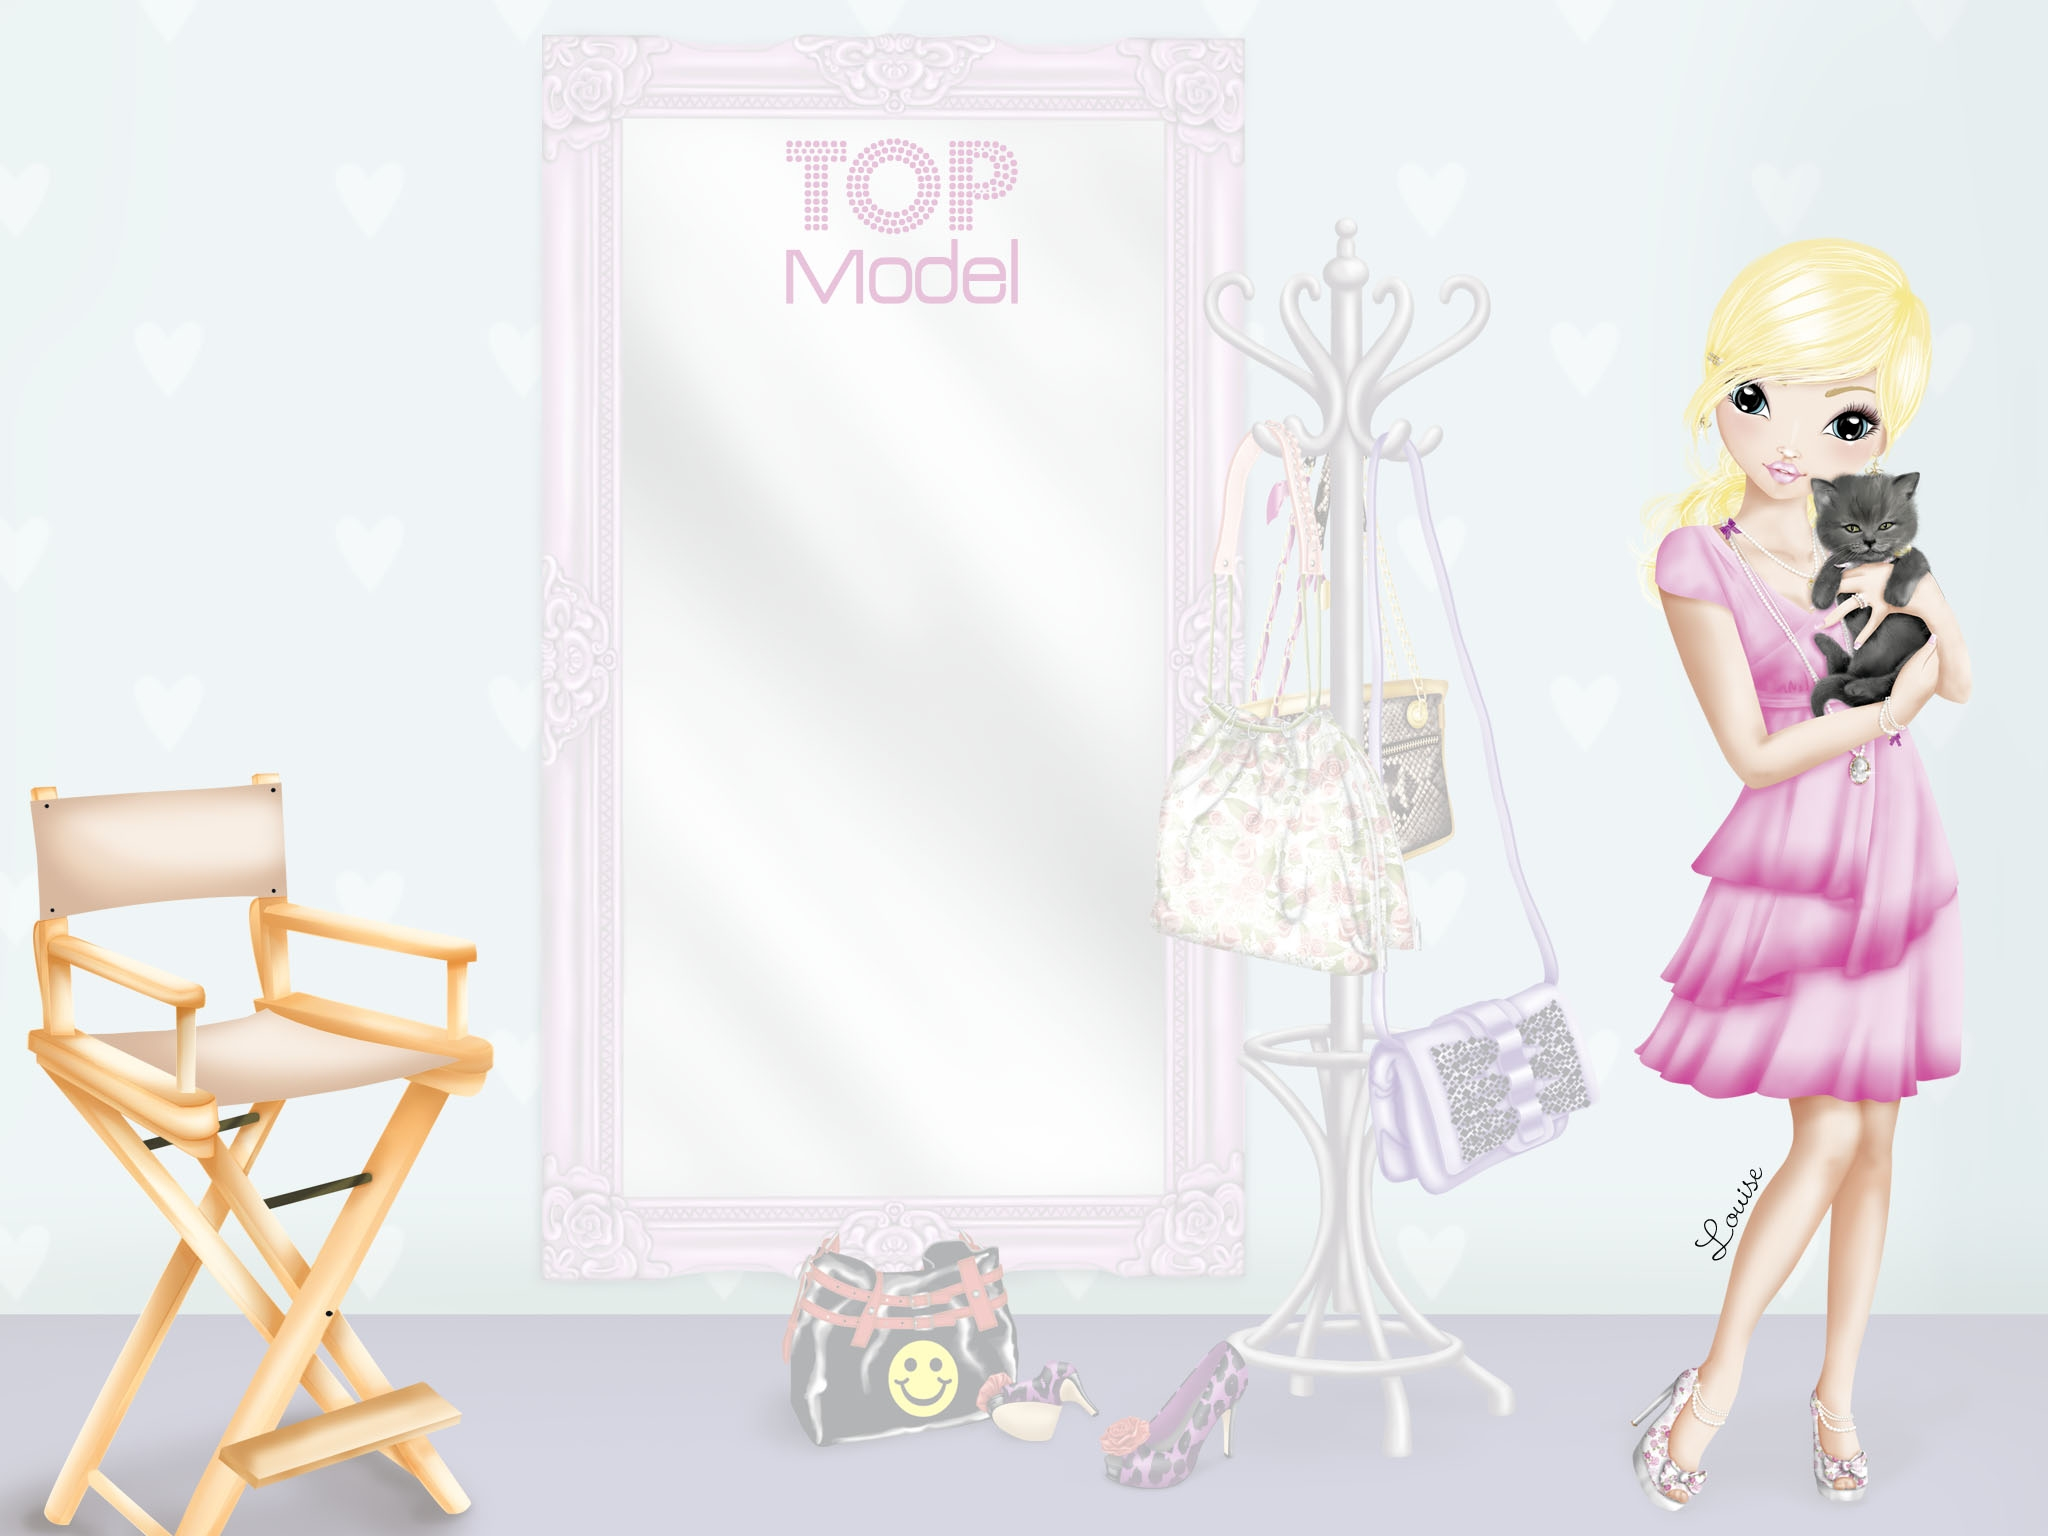 top model wallpapers  top model wallpaper 33105338  fanpop